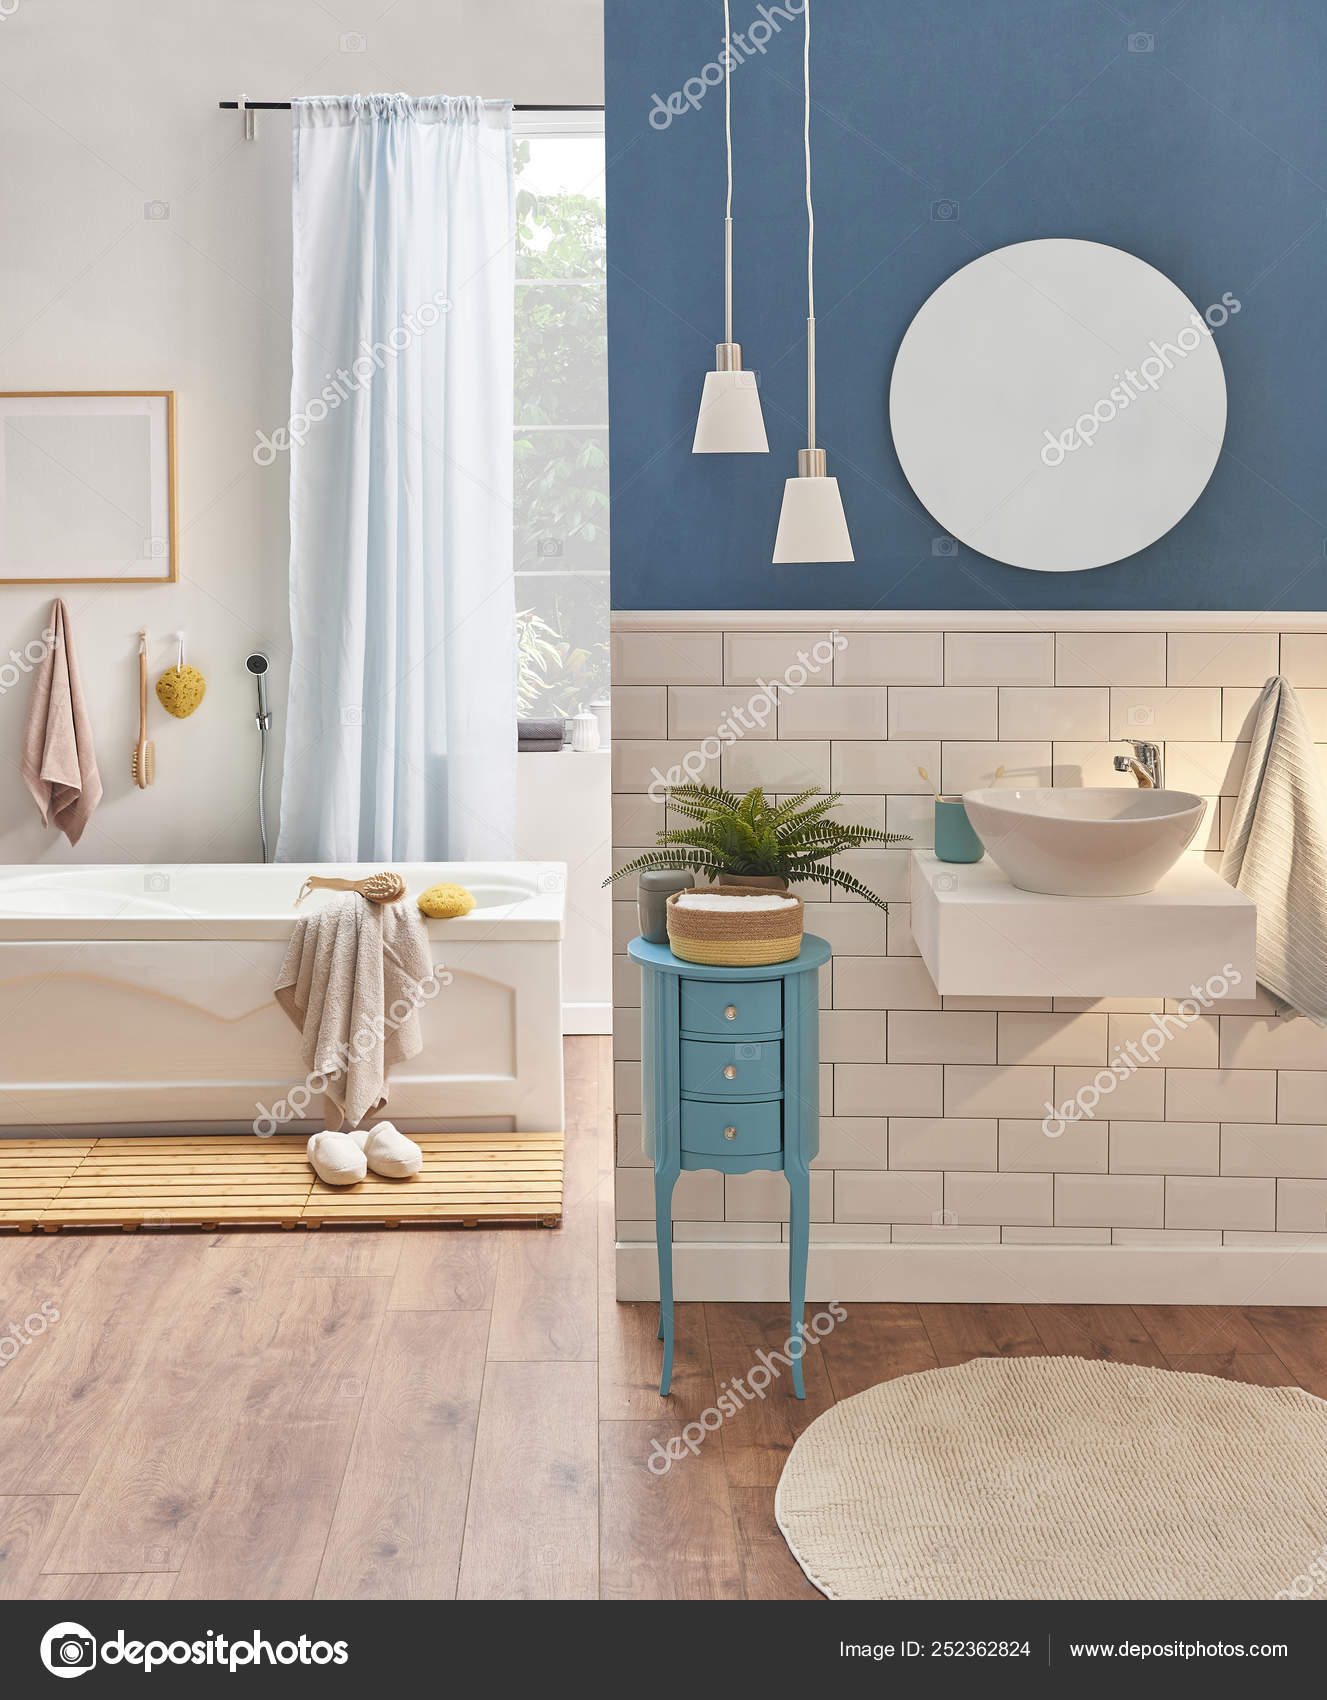 White Blue Wall Decoration White Ceramic Sink Style Bath Room Stock Photo C Unitedphotostudio 252362824